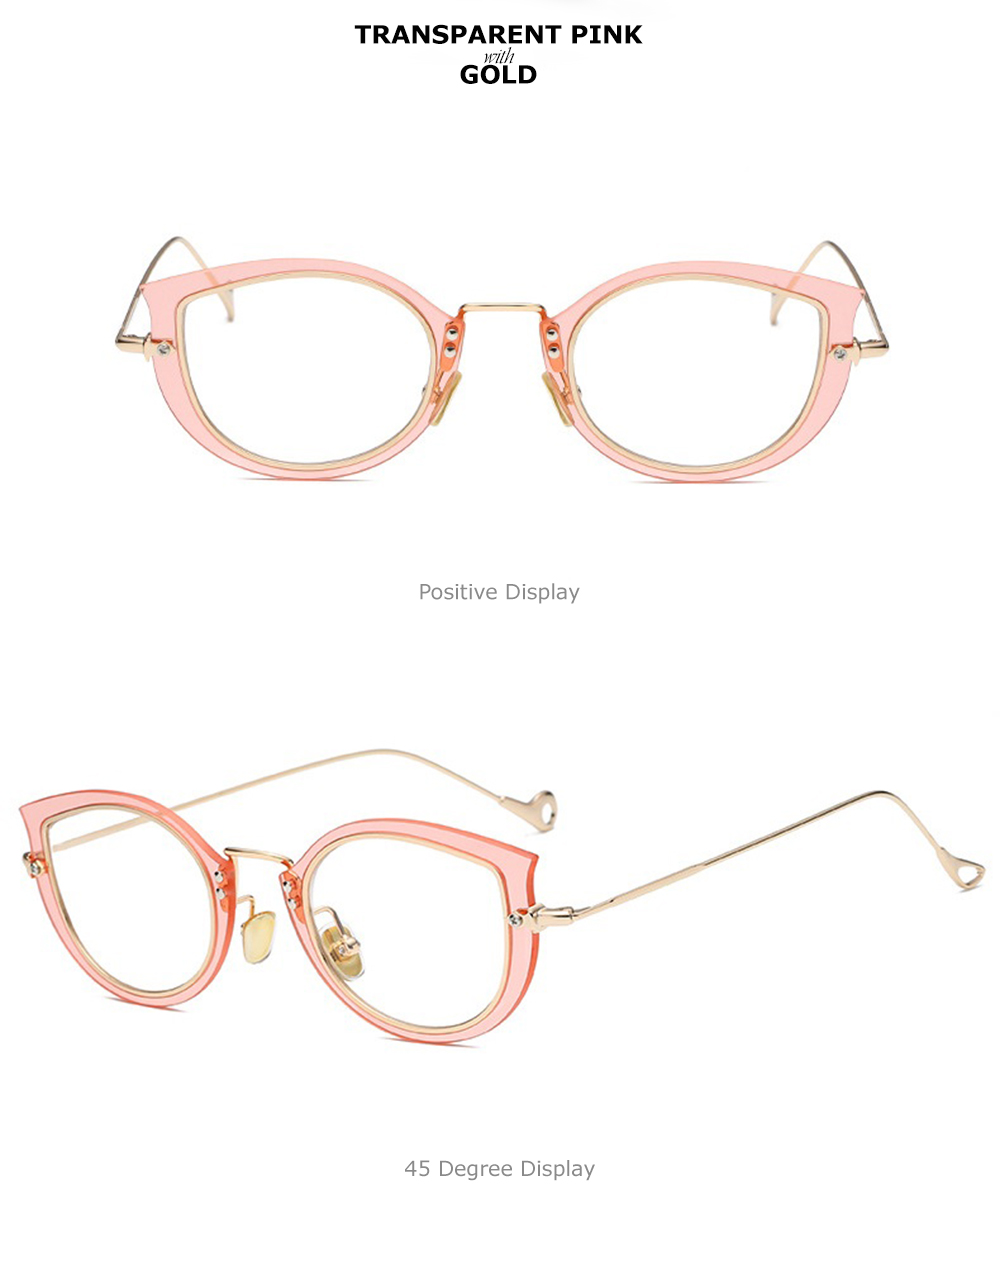 adff1d698ca Chashma Brand Female Eyeglasses Designer Cat Eye Stylish Transparent  Optical Glasses Frames Fashion Glasses for Women ...